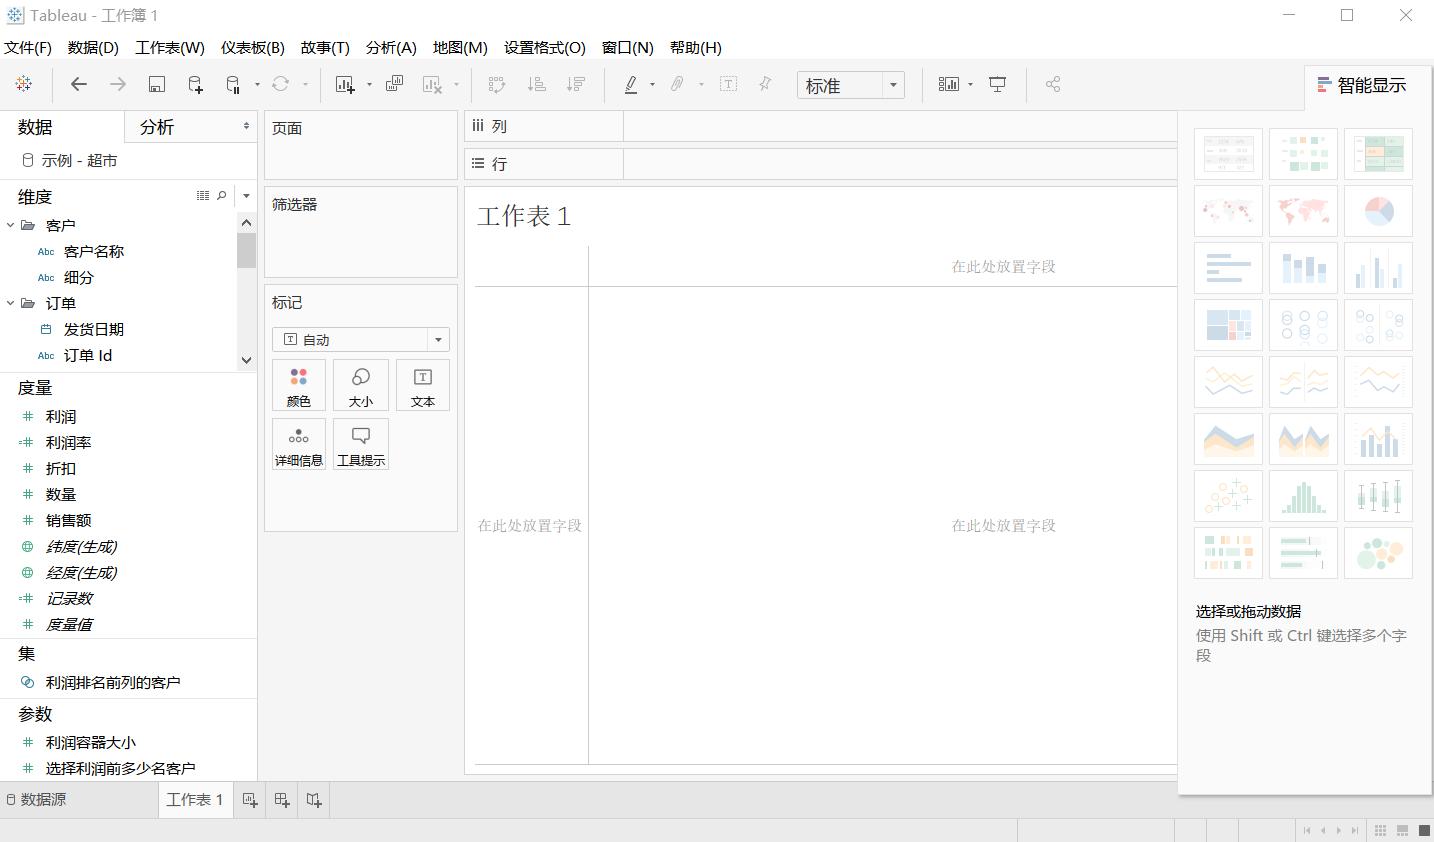 Tableau Desktop Pro v2020.1.2 专业的数据可视化分析软件